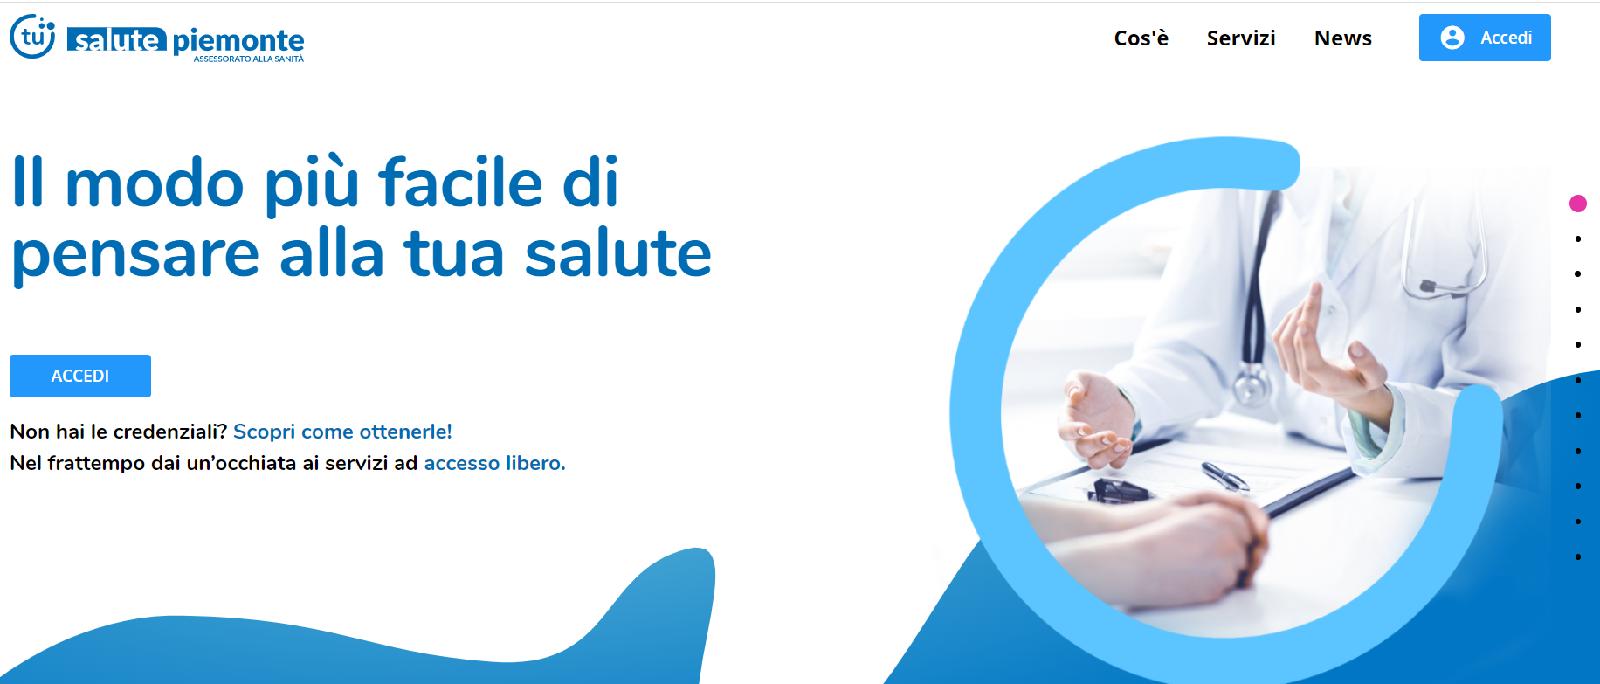 Homepage salute piemonte